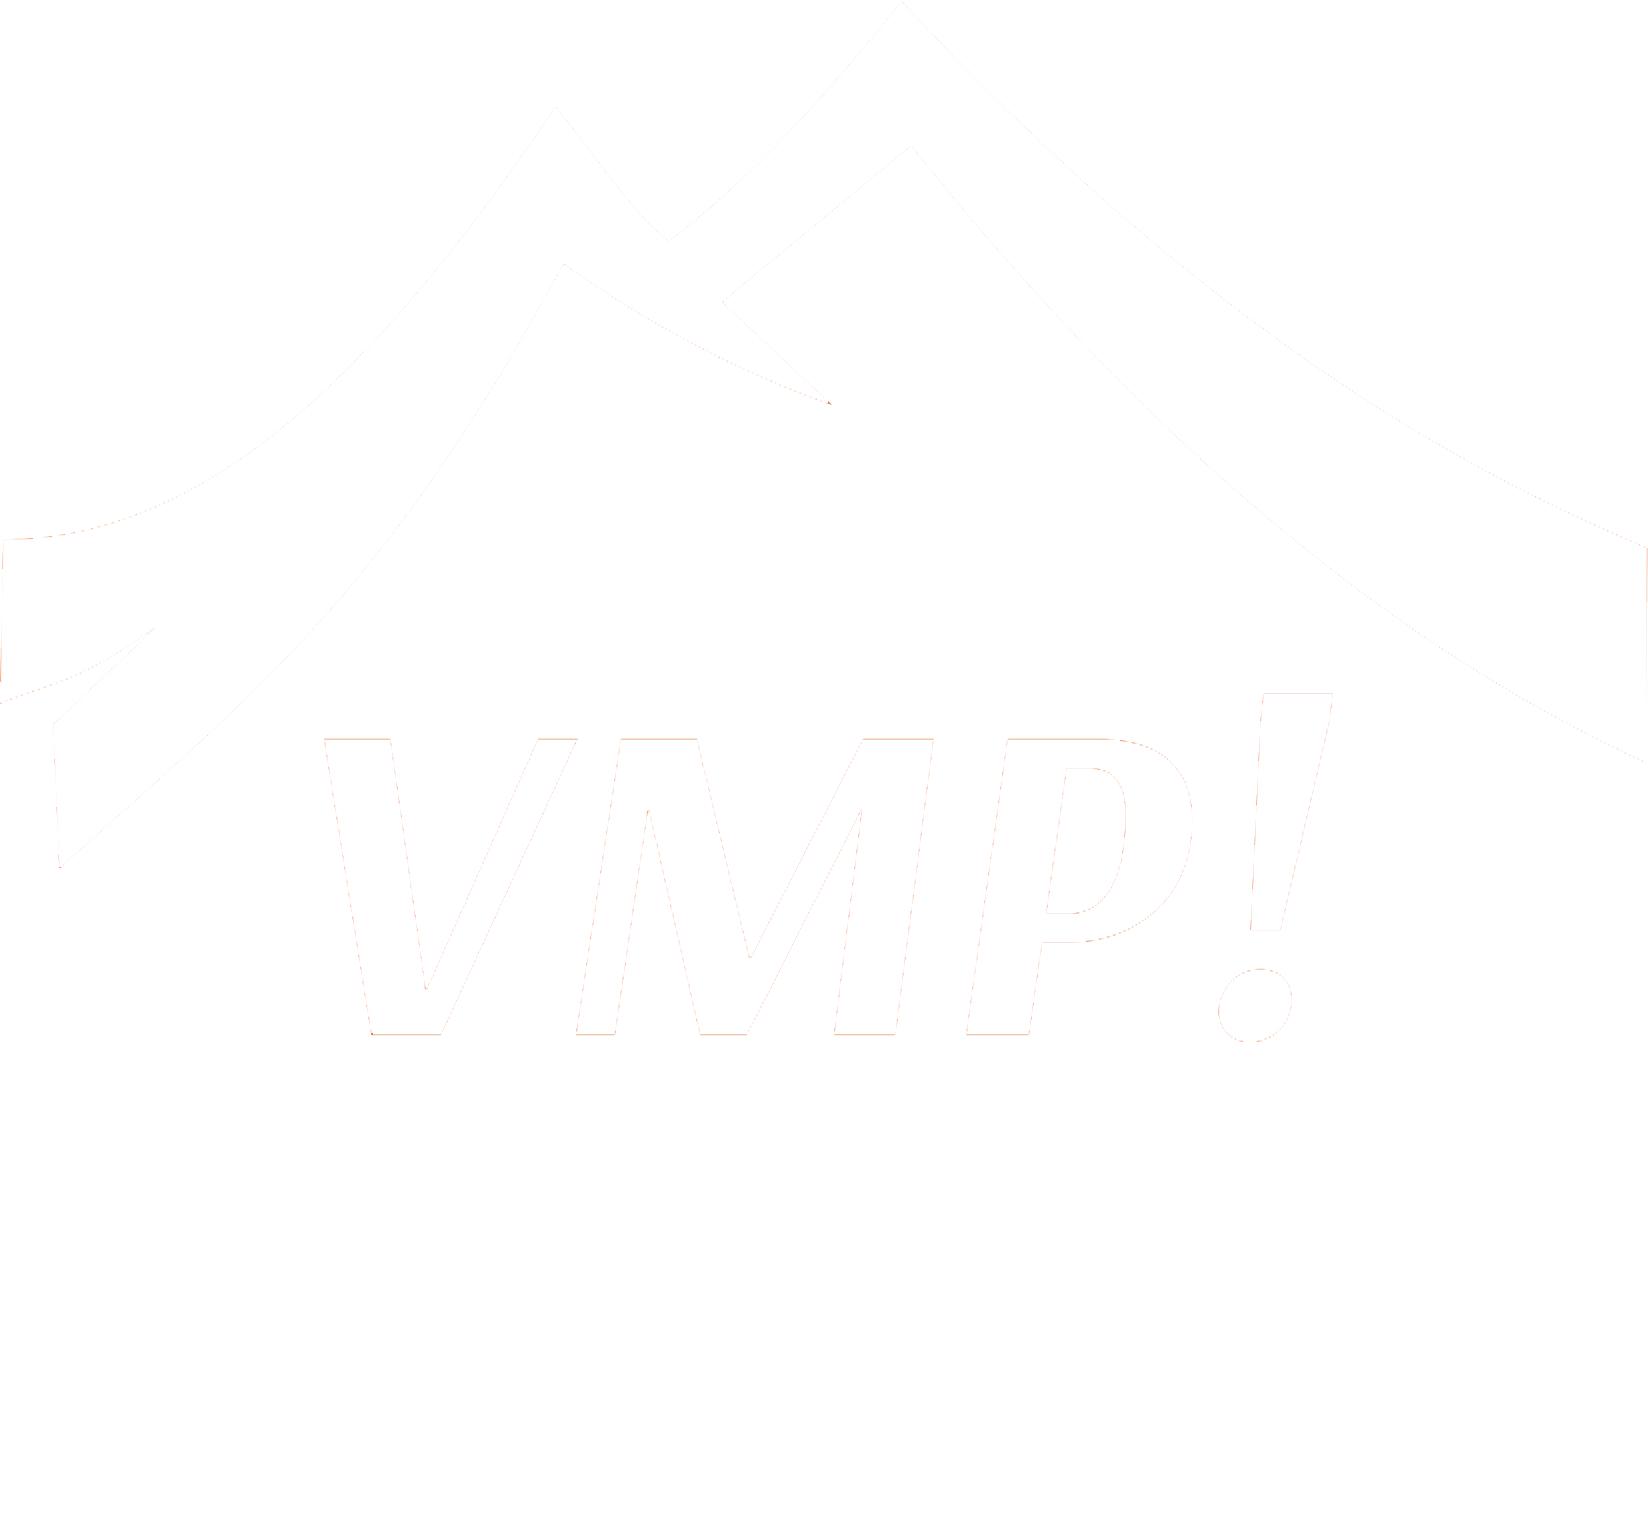 LOGO-VECINOS-POR-MORALZARZAL-PARTICIPA-completo